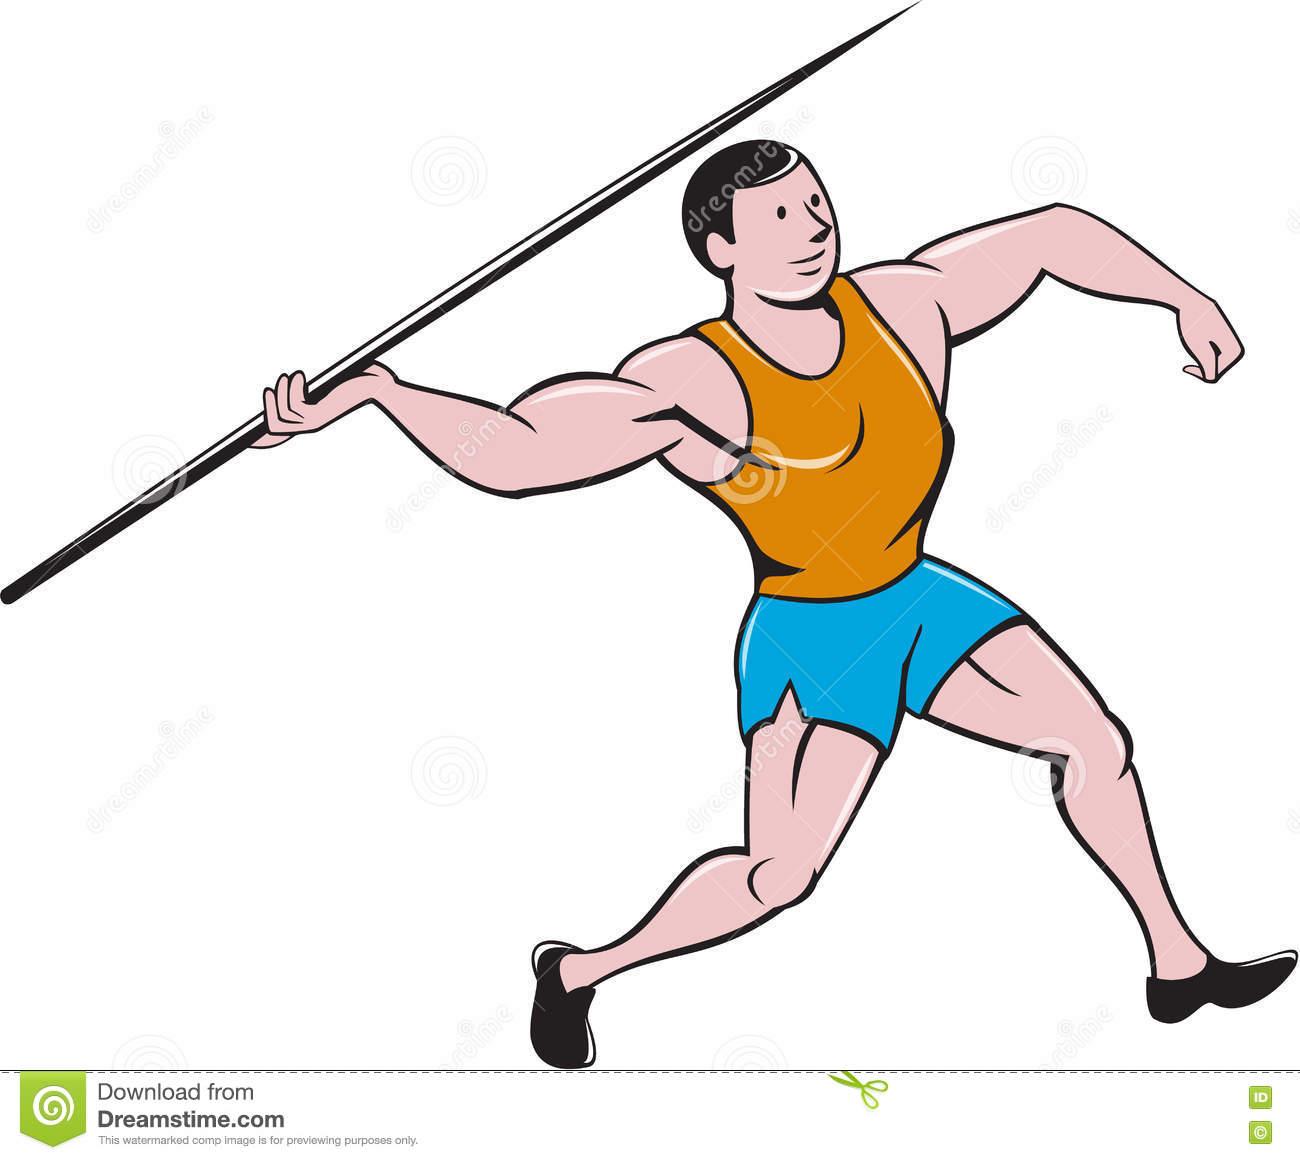 Javelin Throw Cartoon.